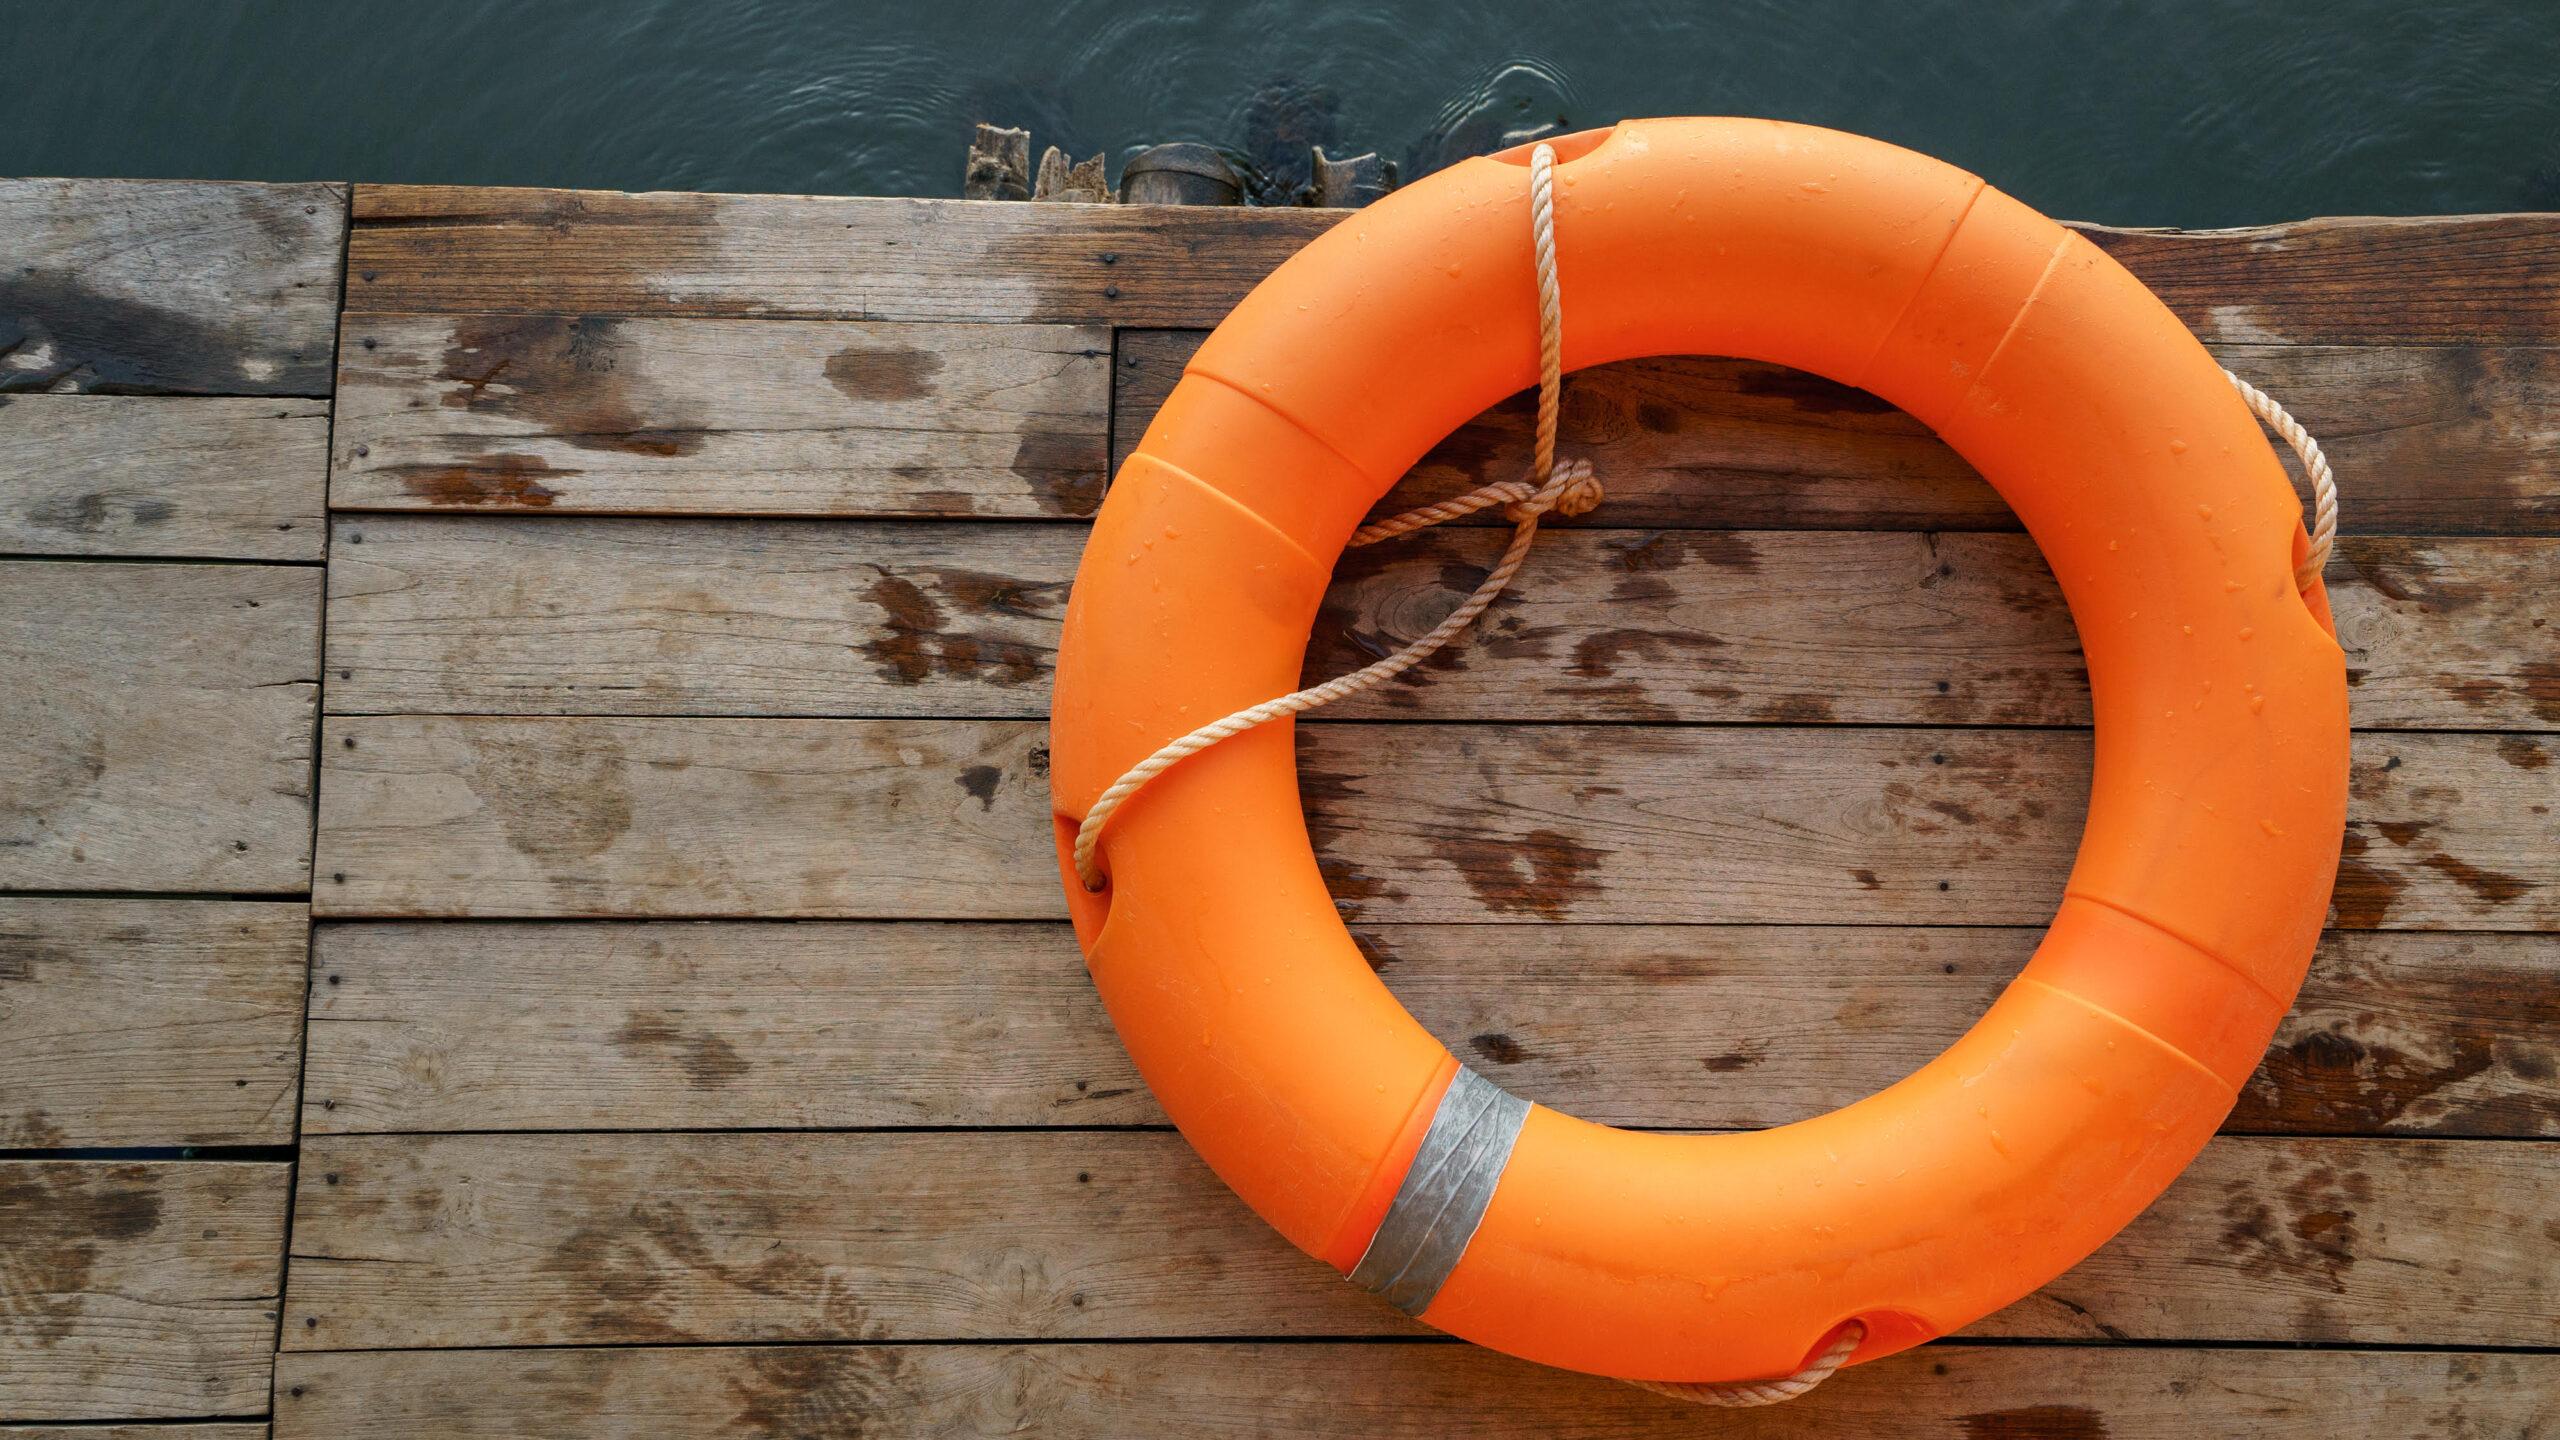 Orange lifebuoy, All Water rescue emergency equipment.